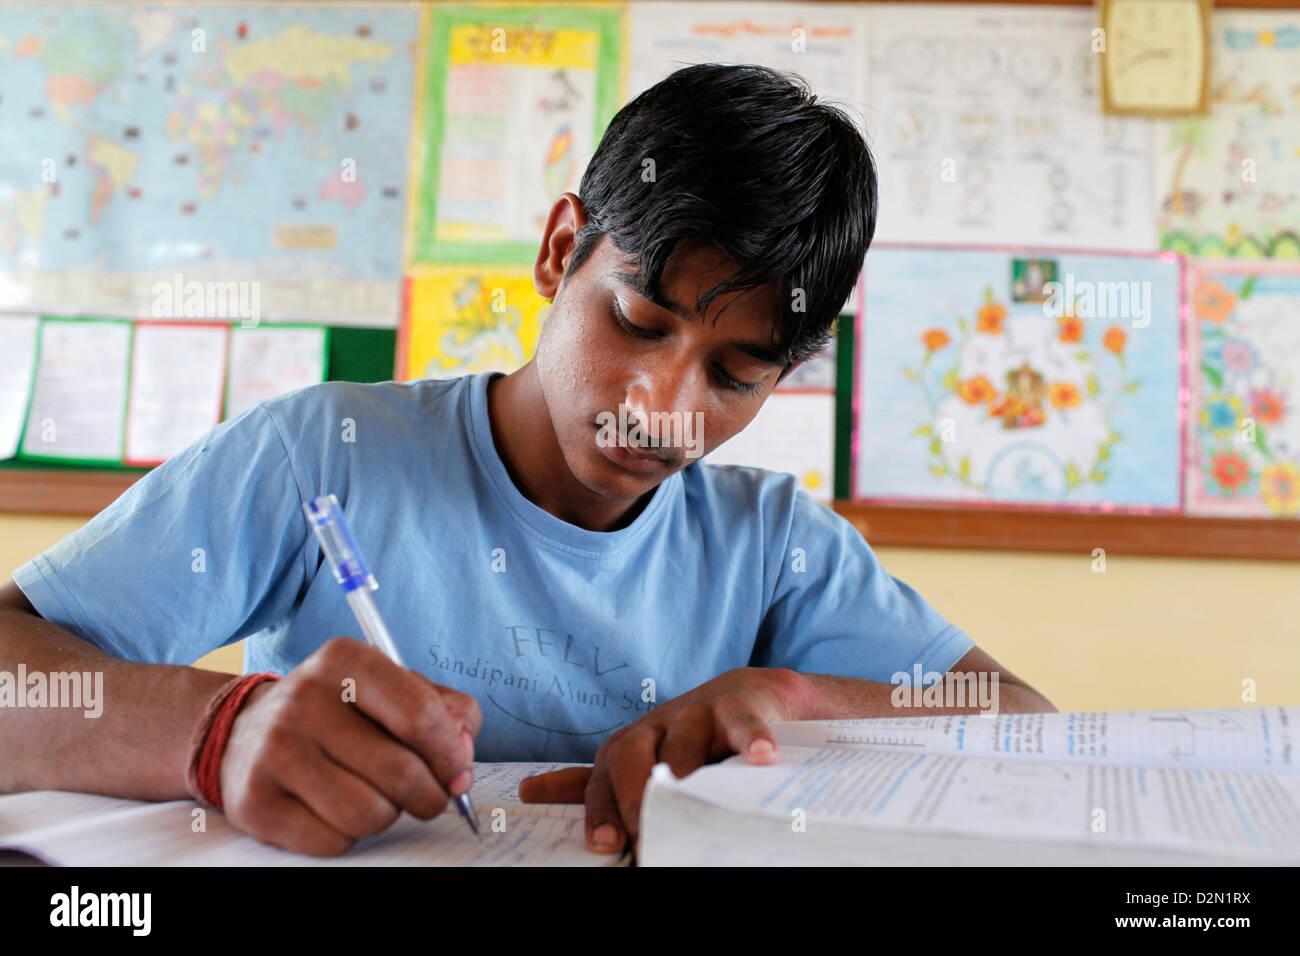 Sandipani Muni high school student, Vrindavan, Uttar Pradesh, India, Asia - Stock Image